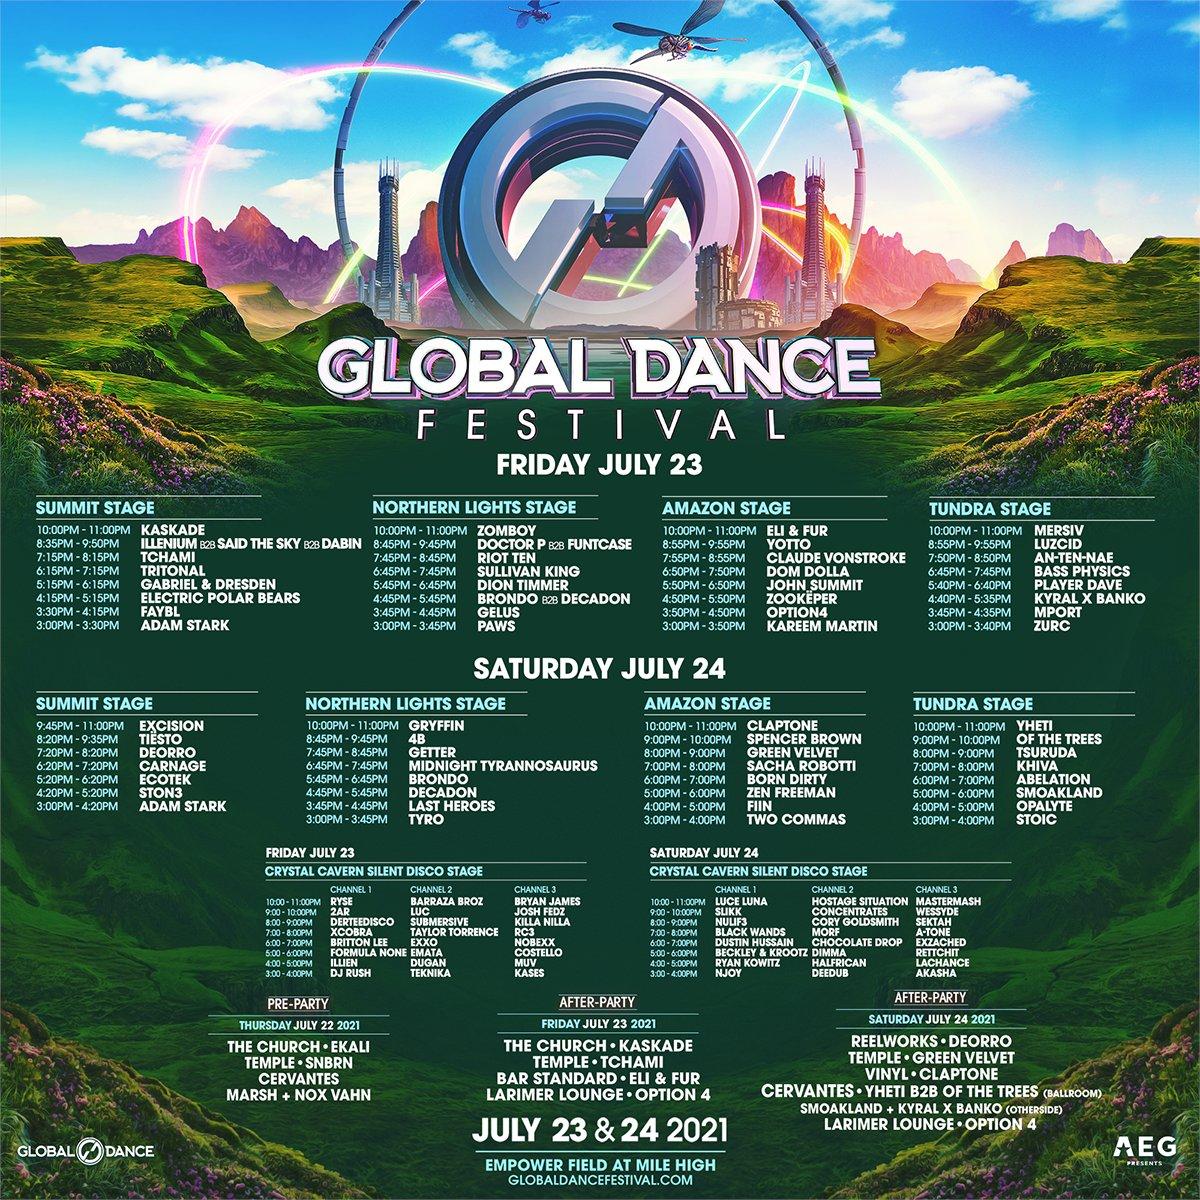 Global Dance Festival 2021 schedule